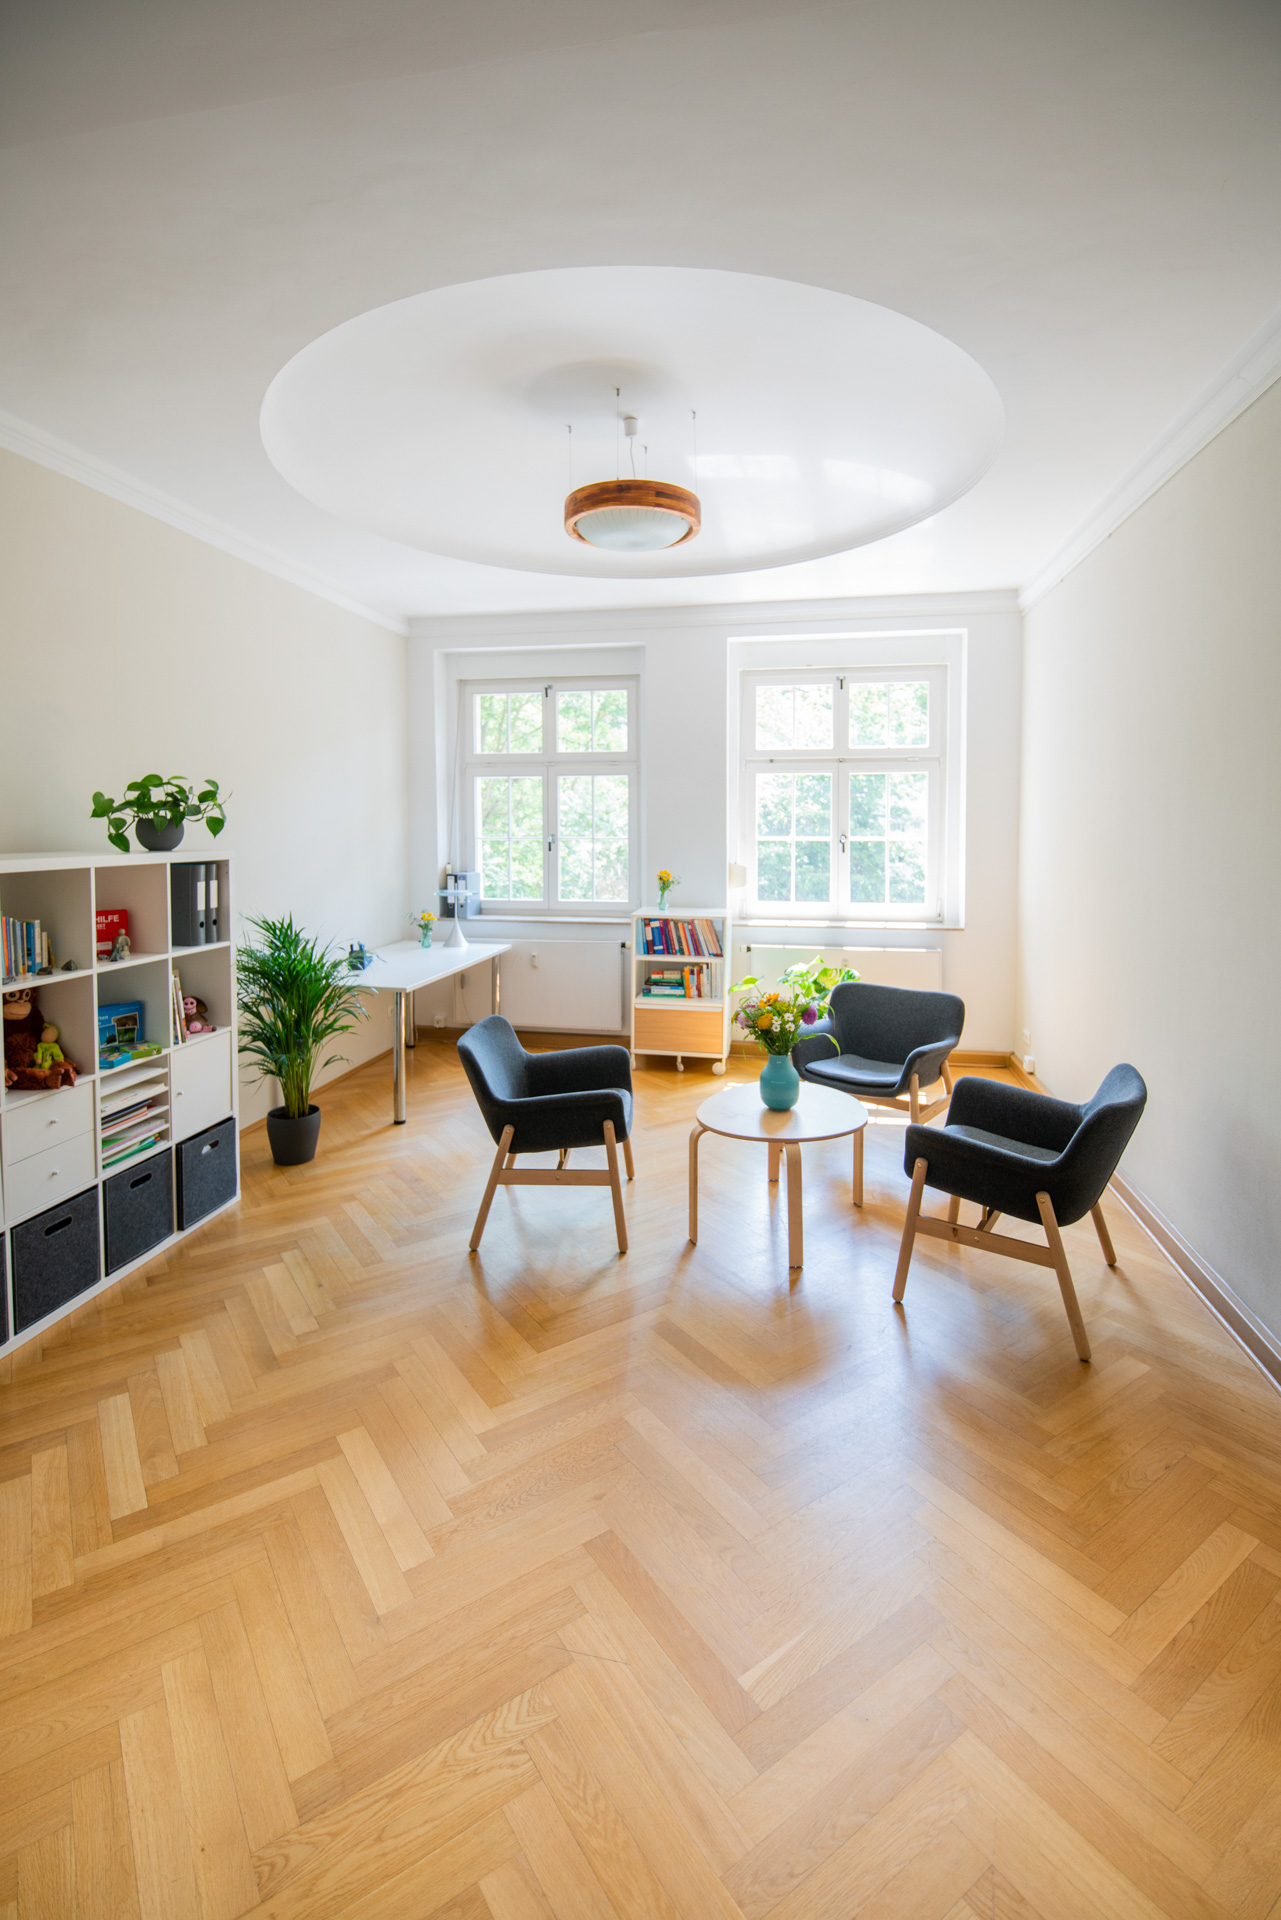 Crostewitz-Trauma-Traumatherapie-Psychotherapie-Leipzig-Heilpraktiker-07647